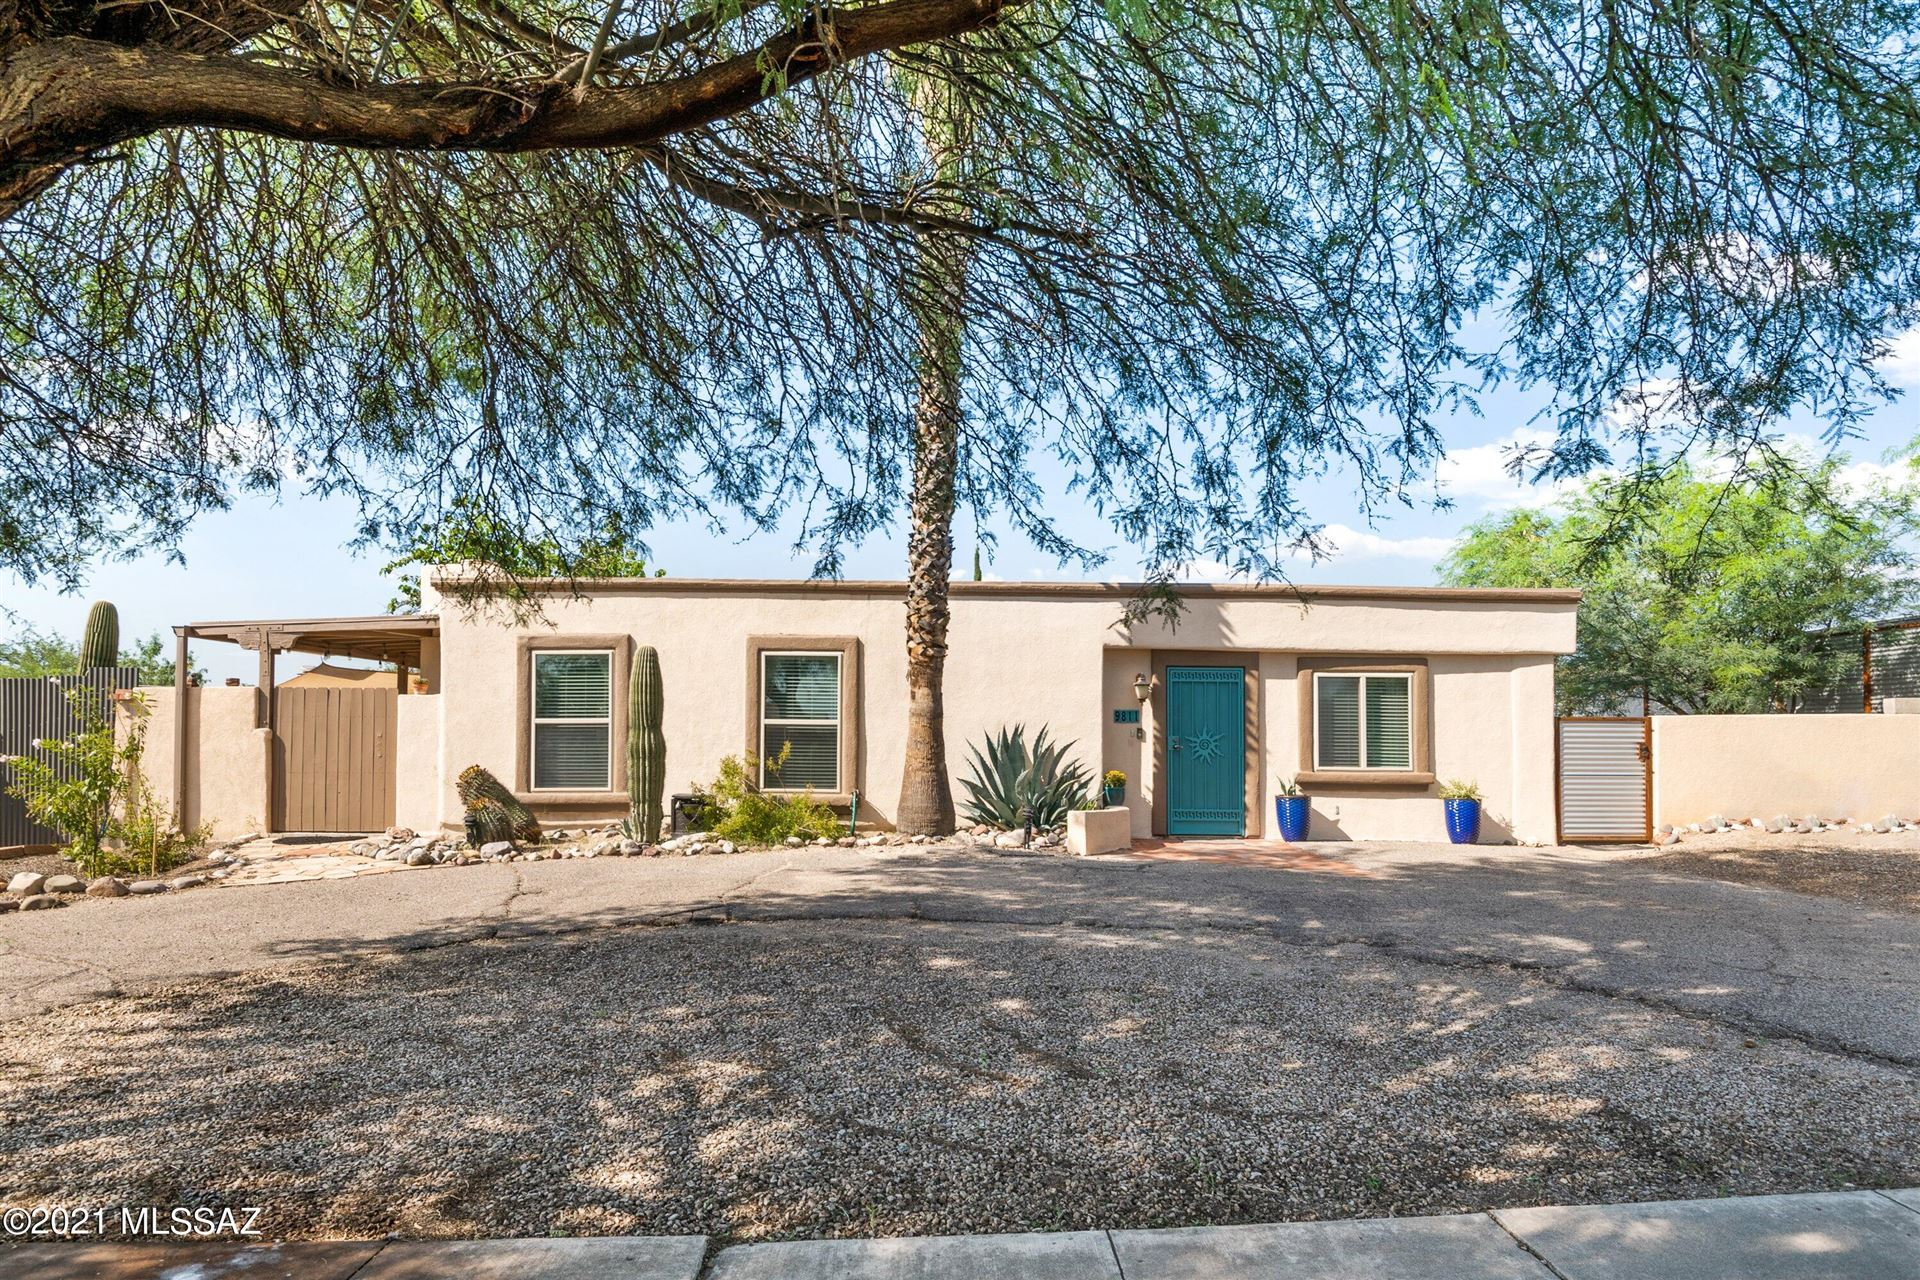 9811 E Golf Links Road, Tucson, AZ 85730 - MLS#: 22123683